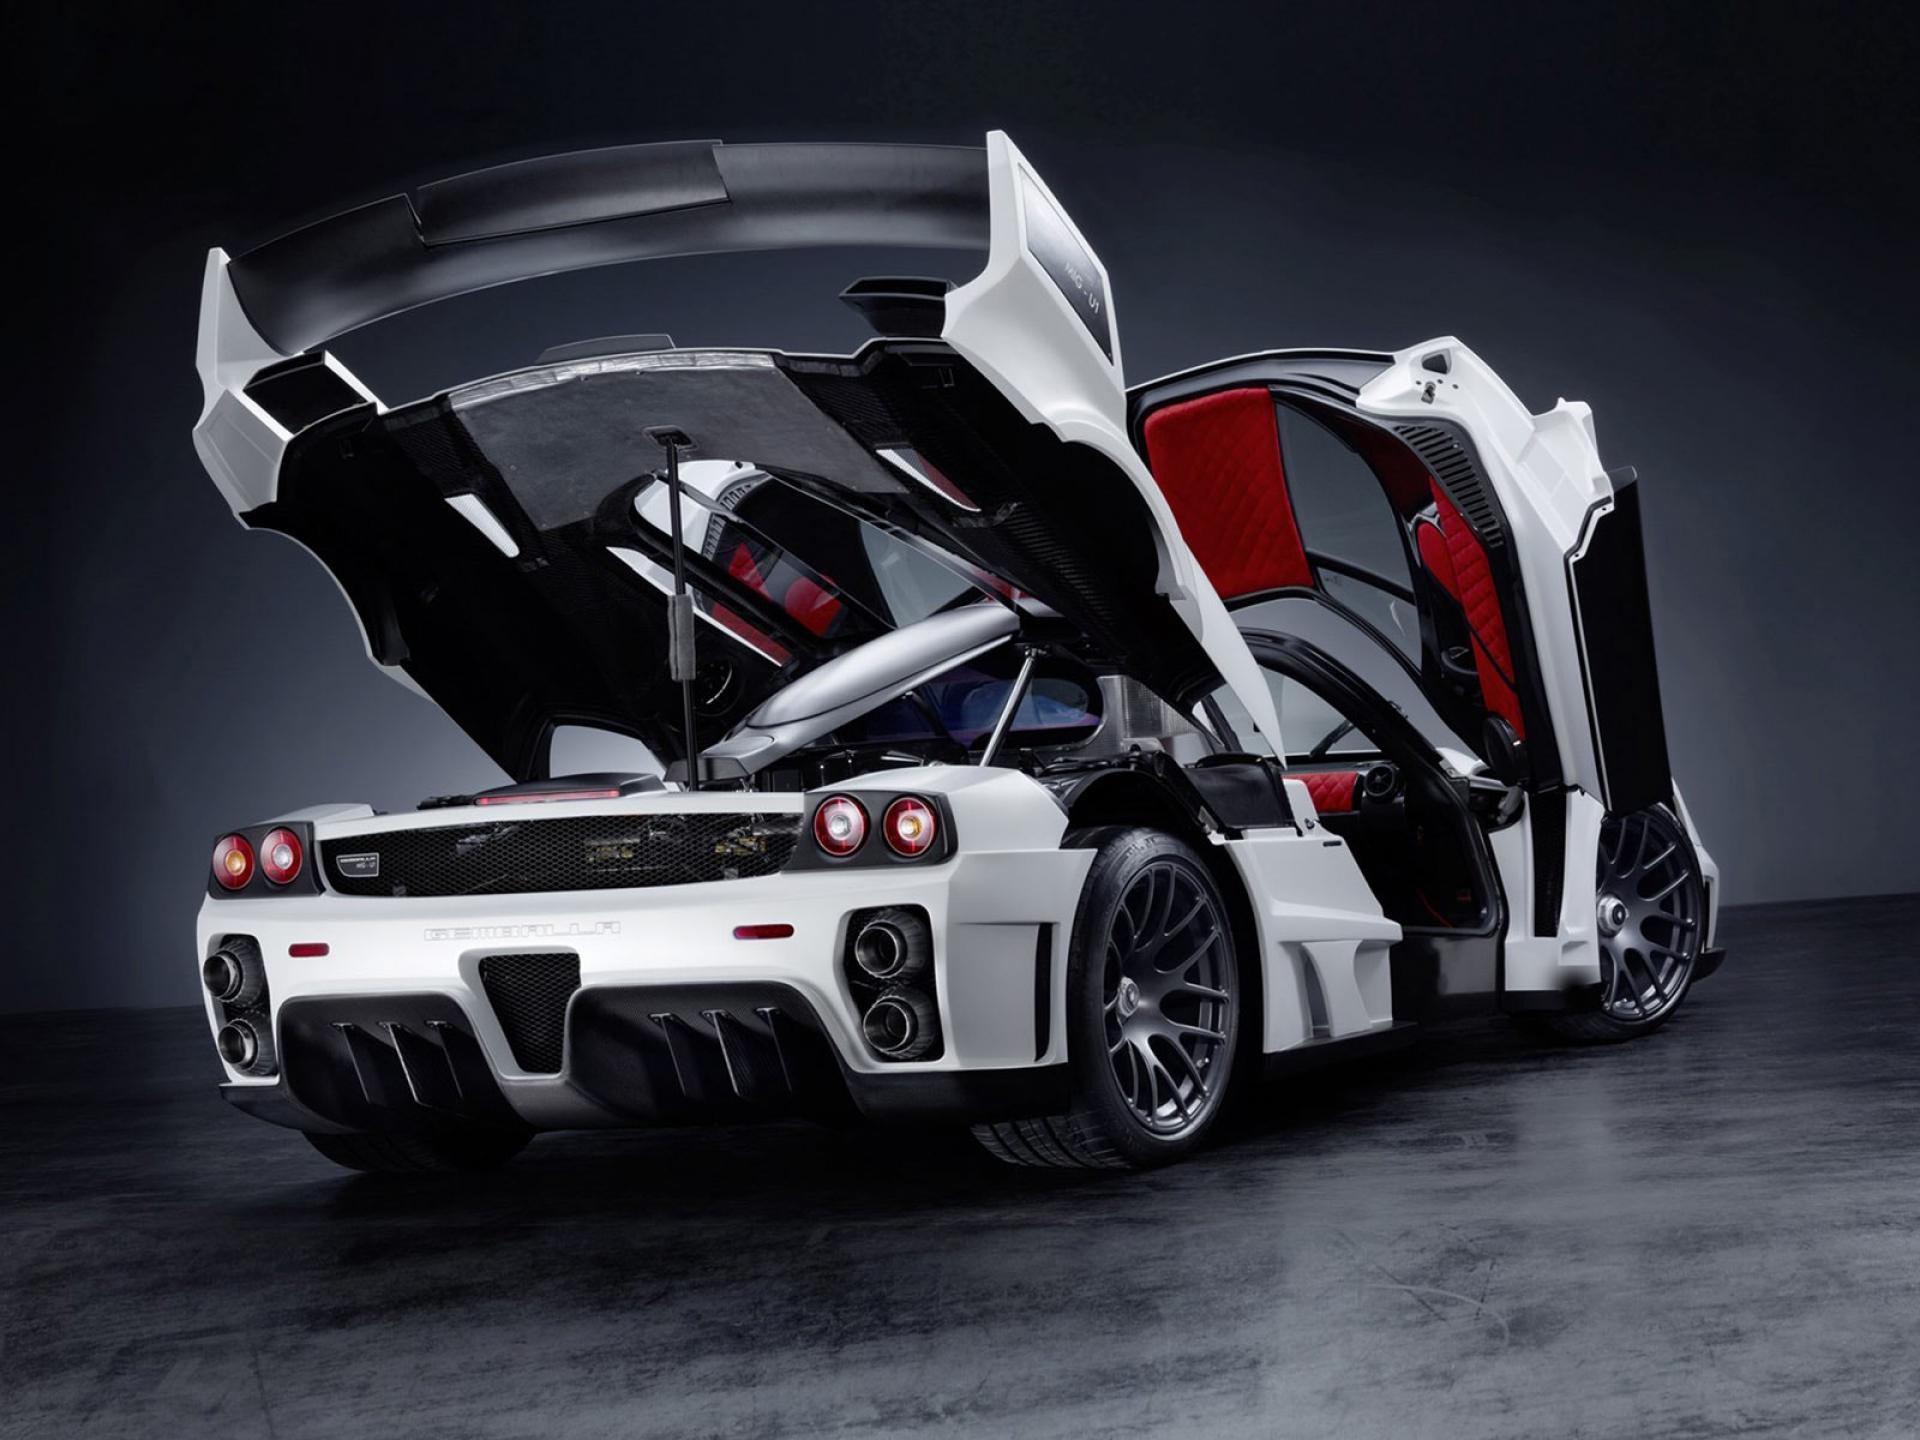 49 Speedy Car Wallpapers For Desktop Download 1920x1440